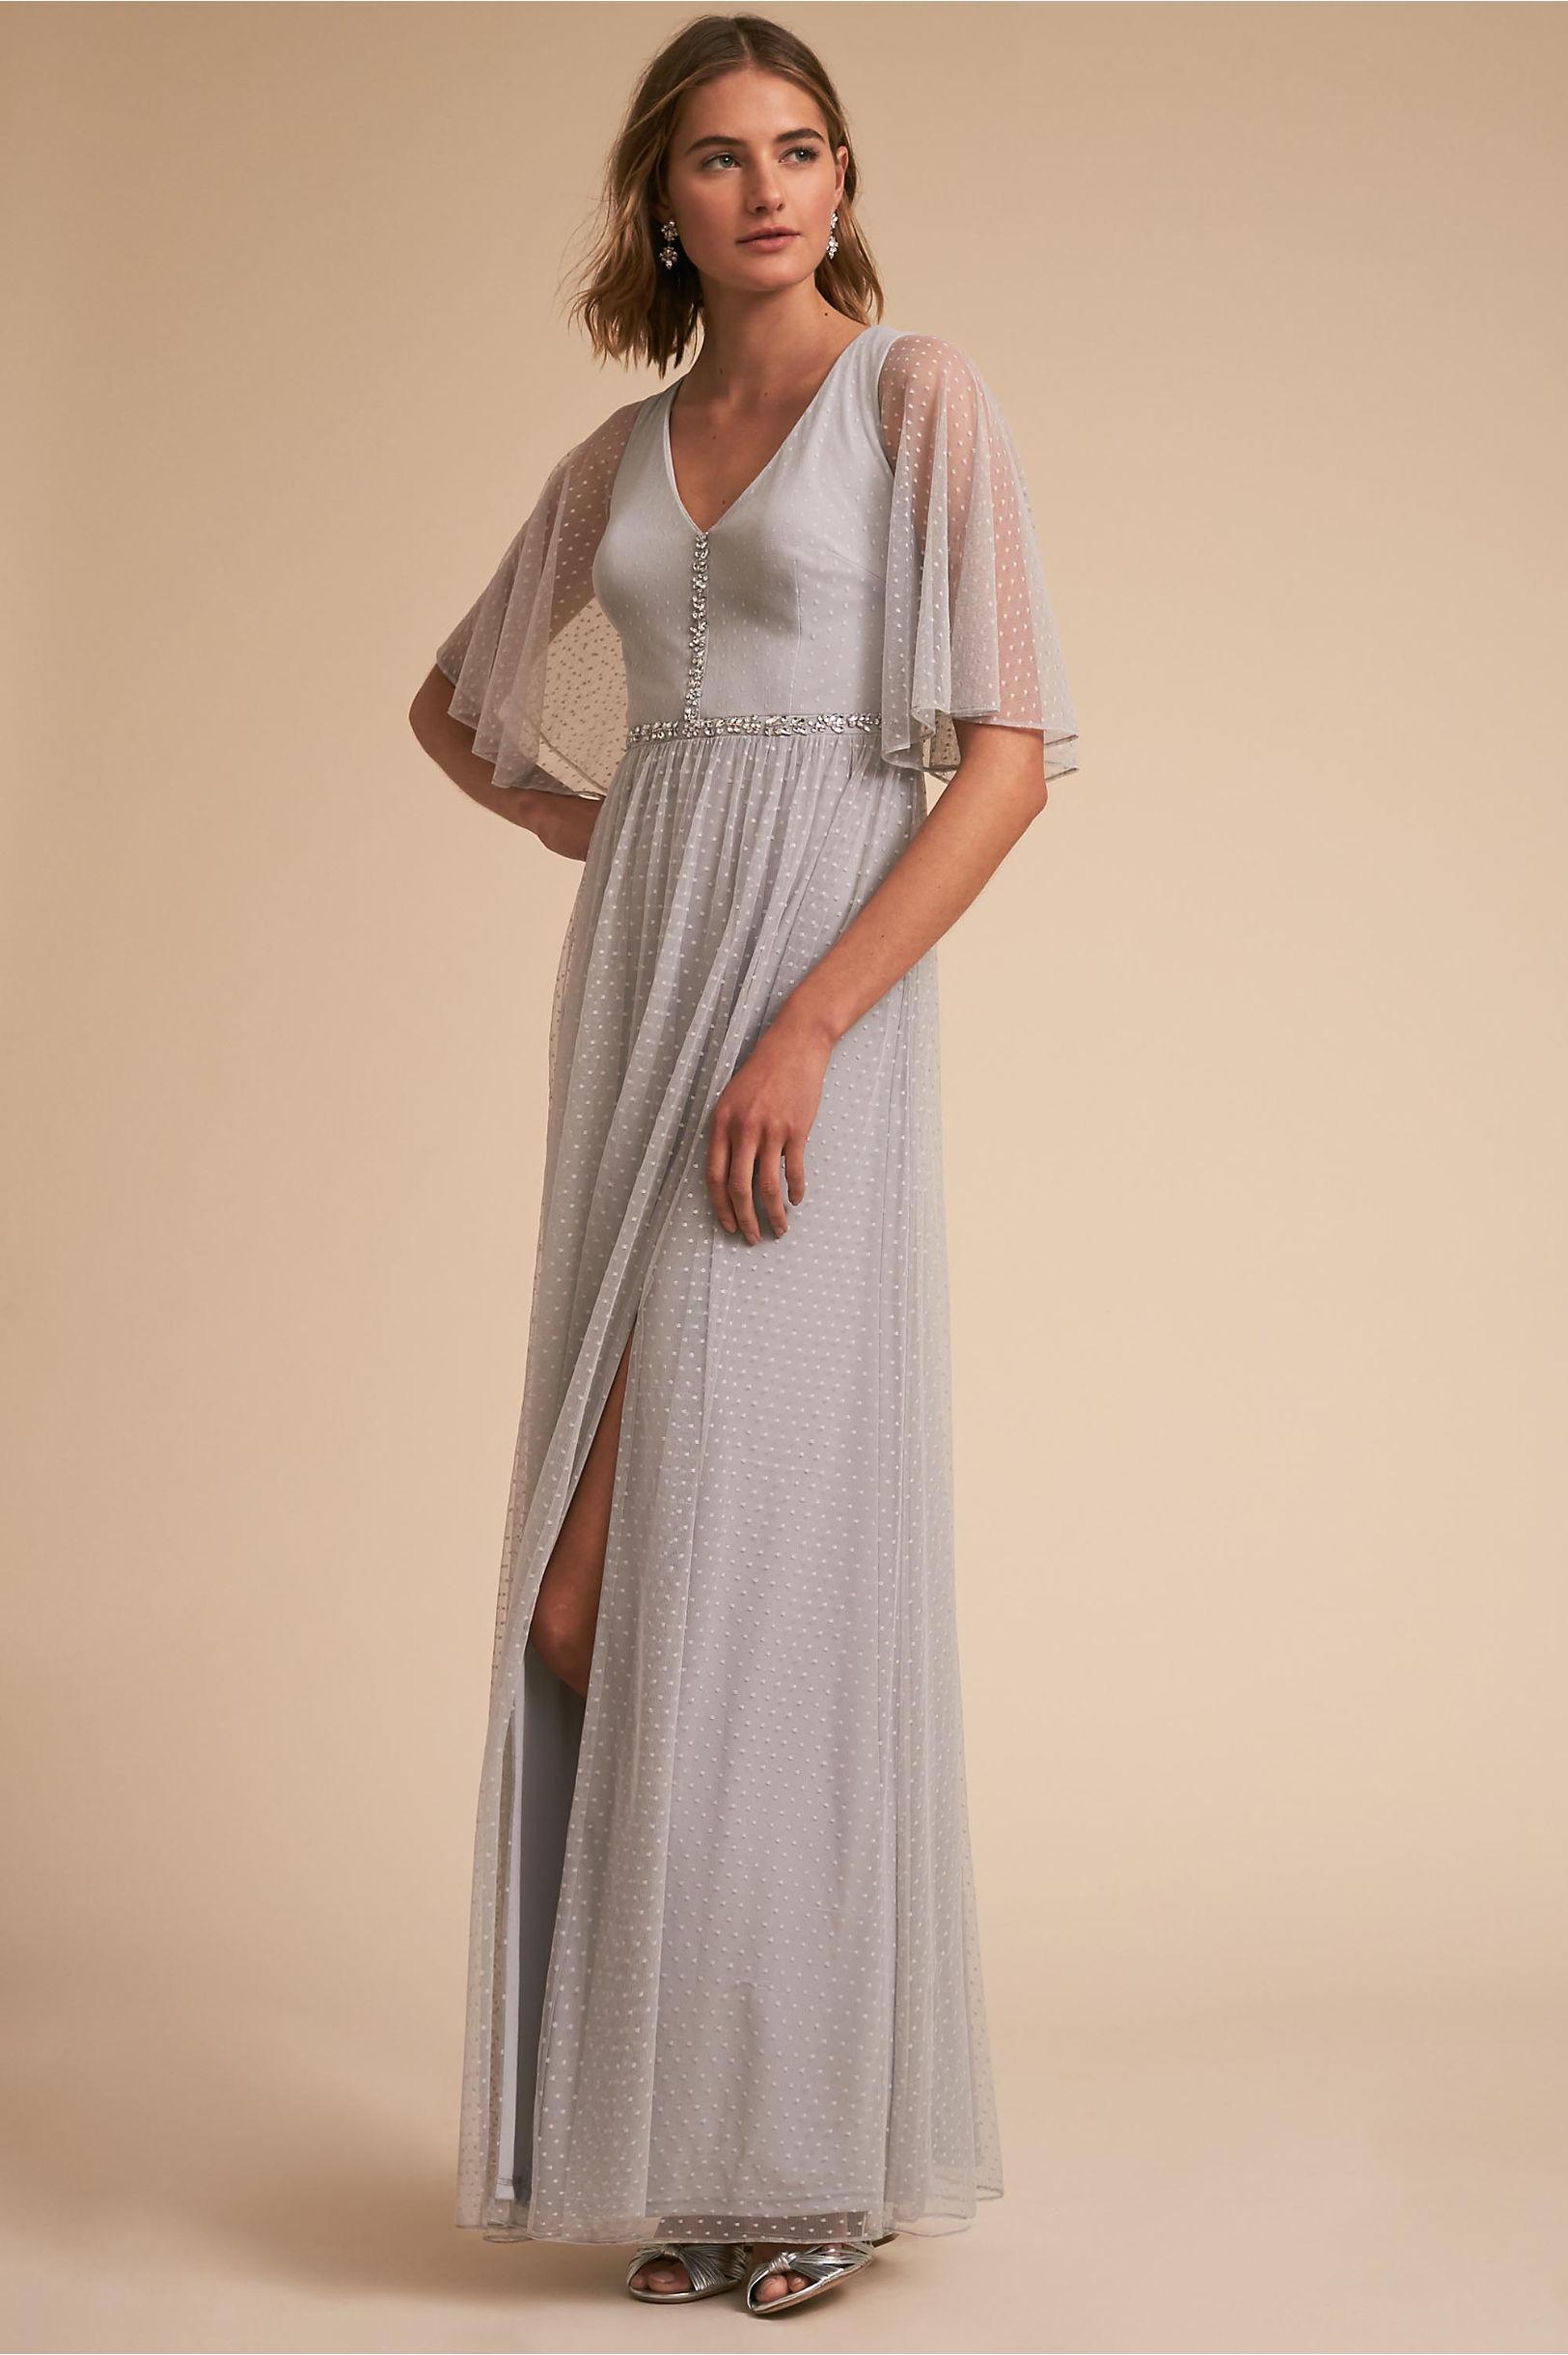 Rivoli Dress in Sale | BHLDN